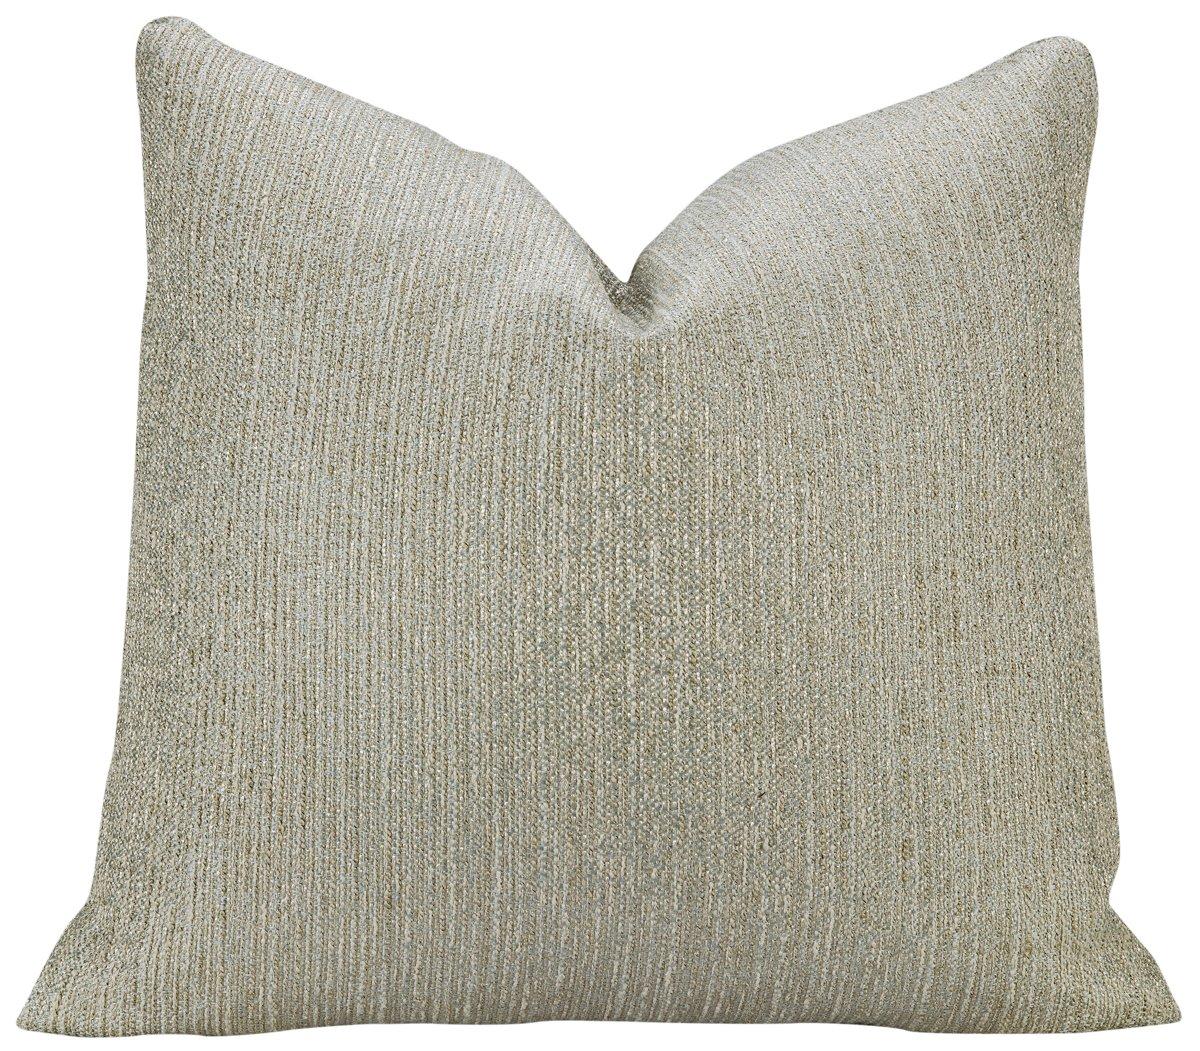 Splatch Light Blue Fabric Square Accent Pillow